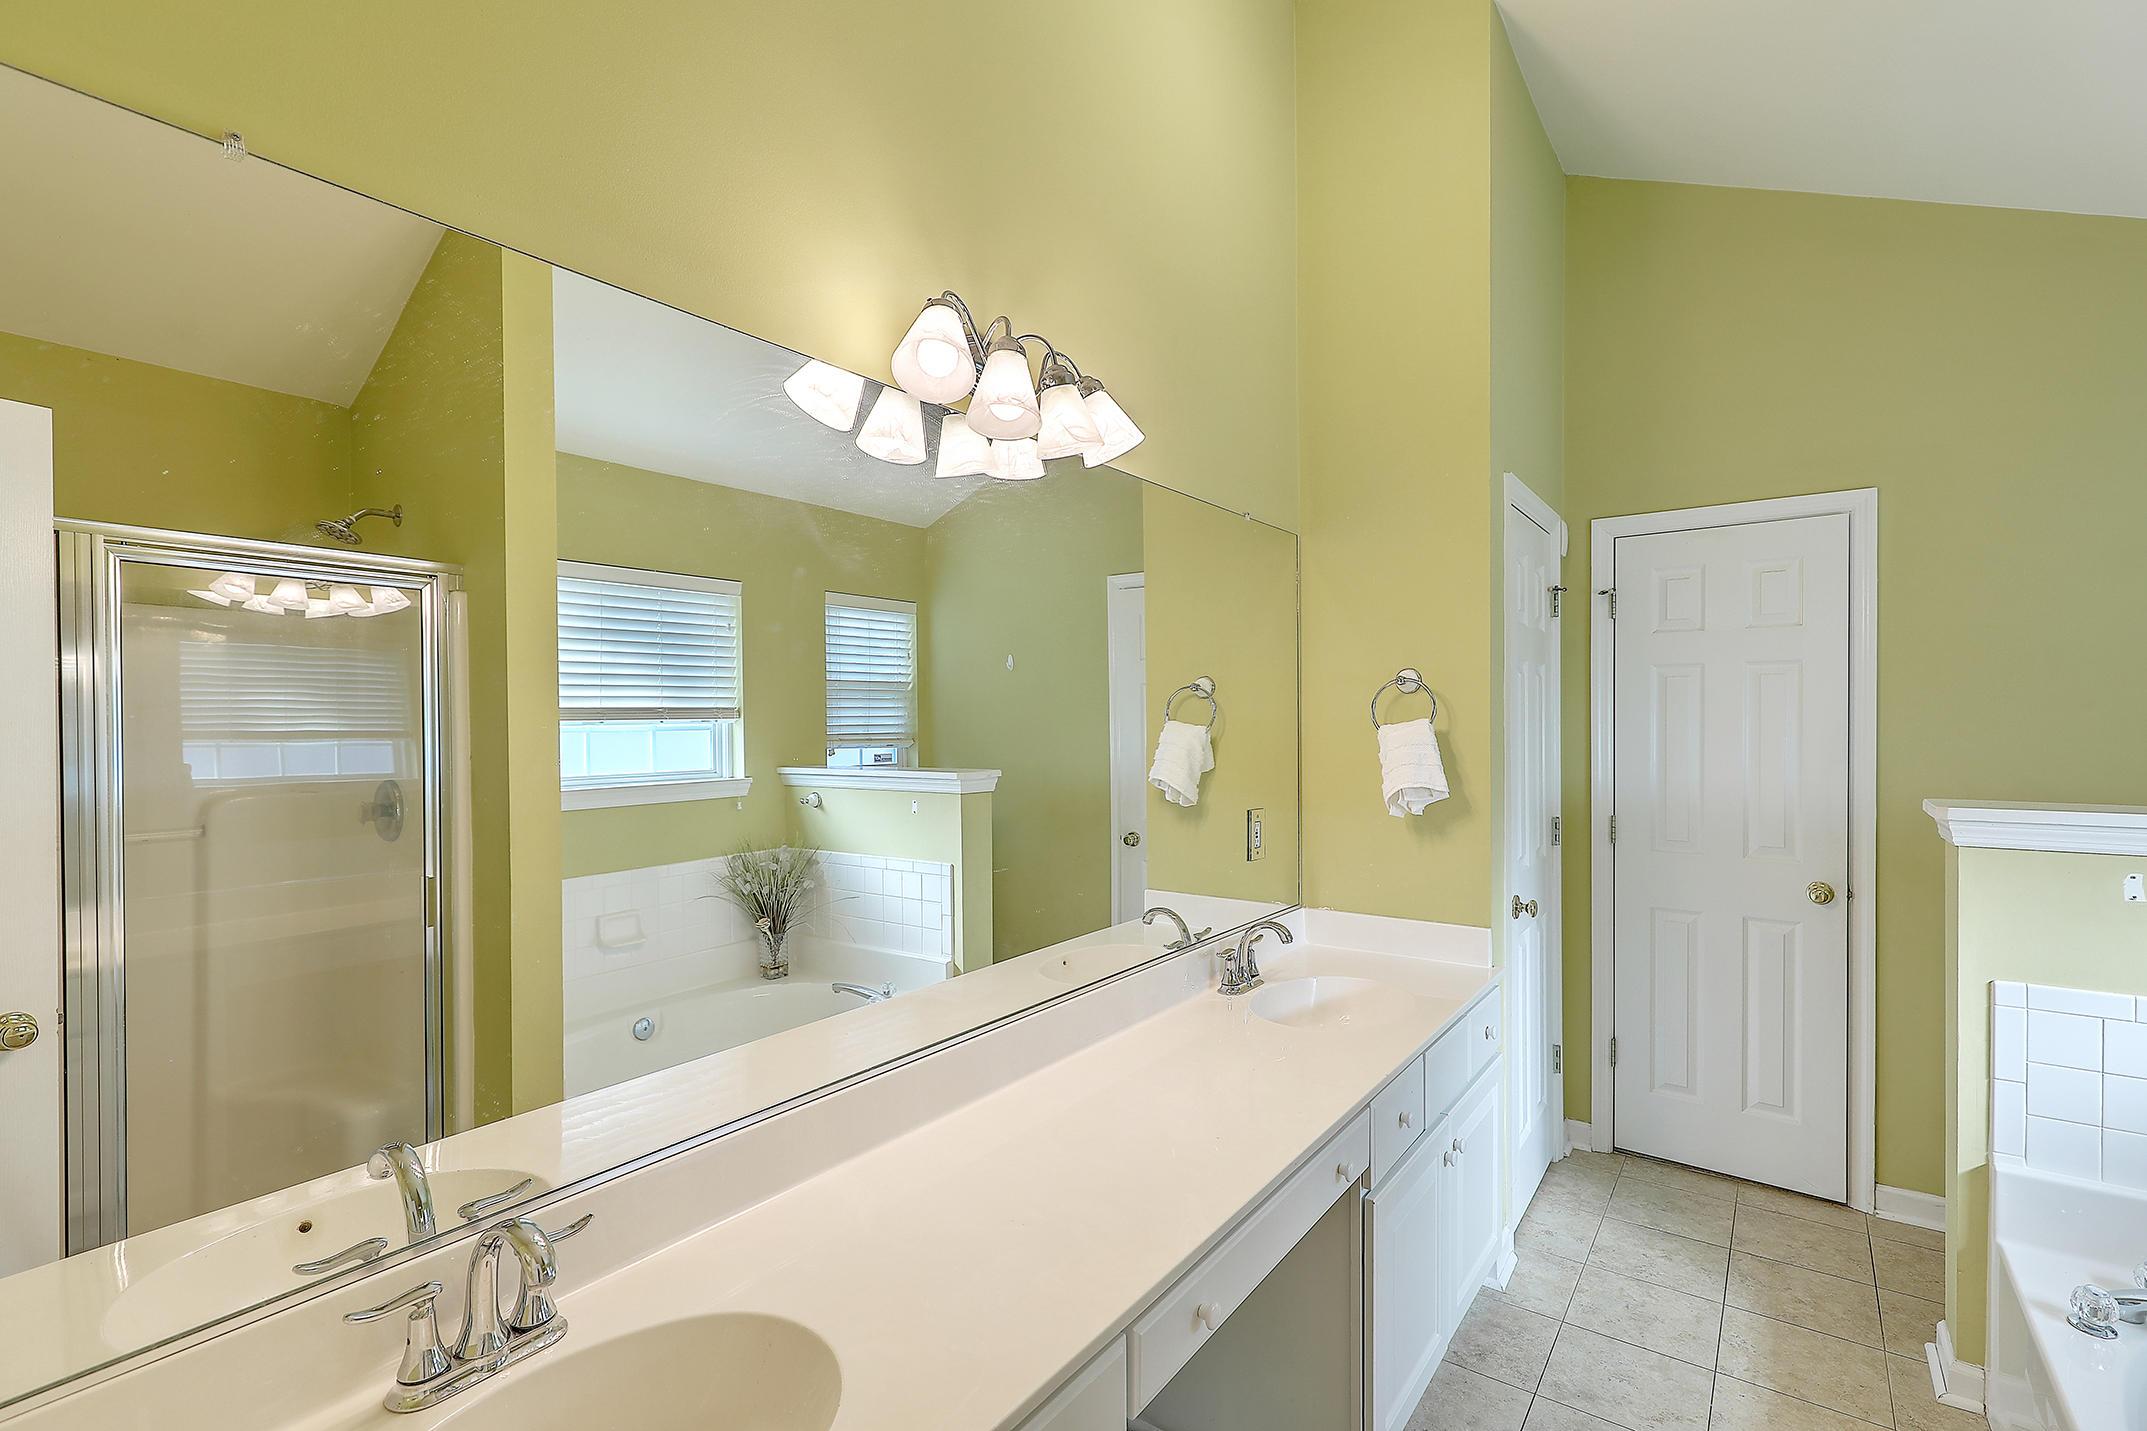 Dunes West Homes For Sale - 1471 Cypress Pointe, Mount Pleasant, SC - 38